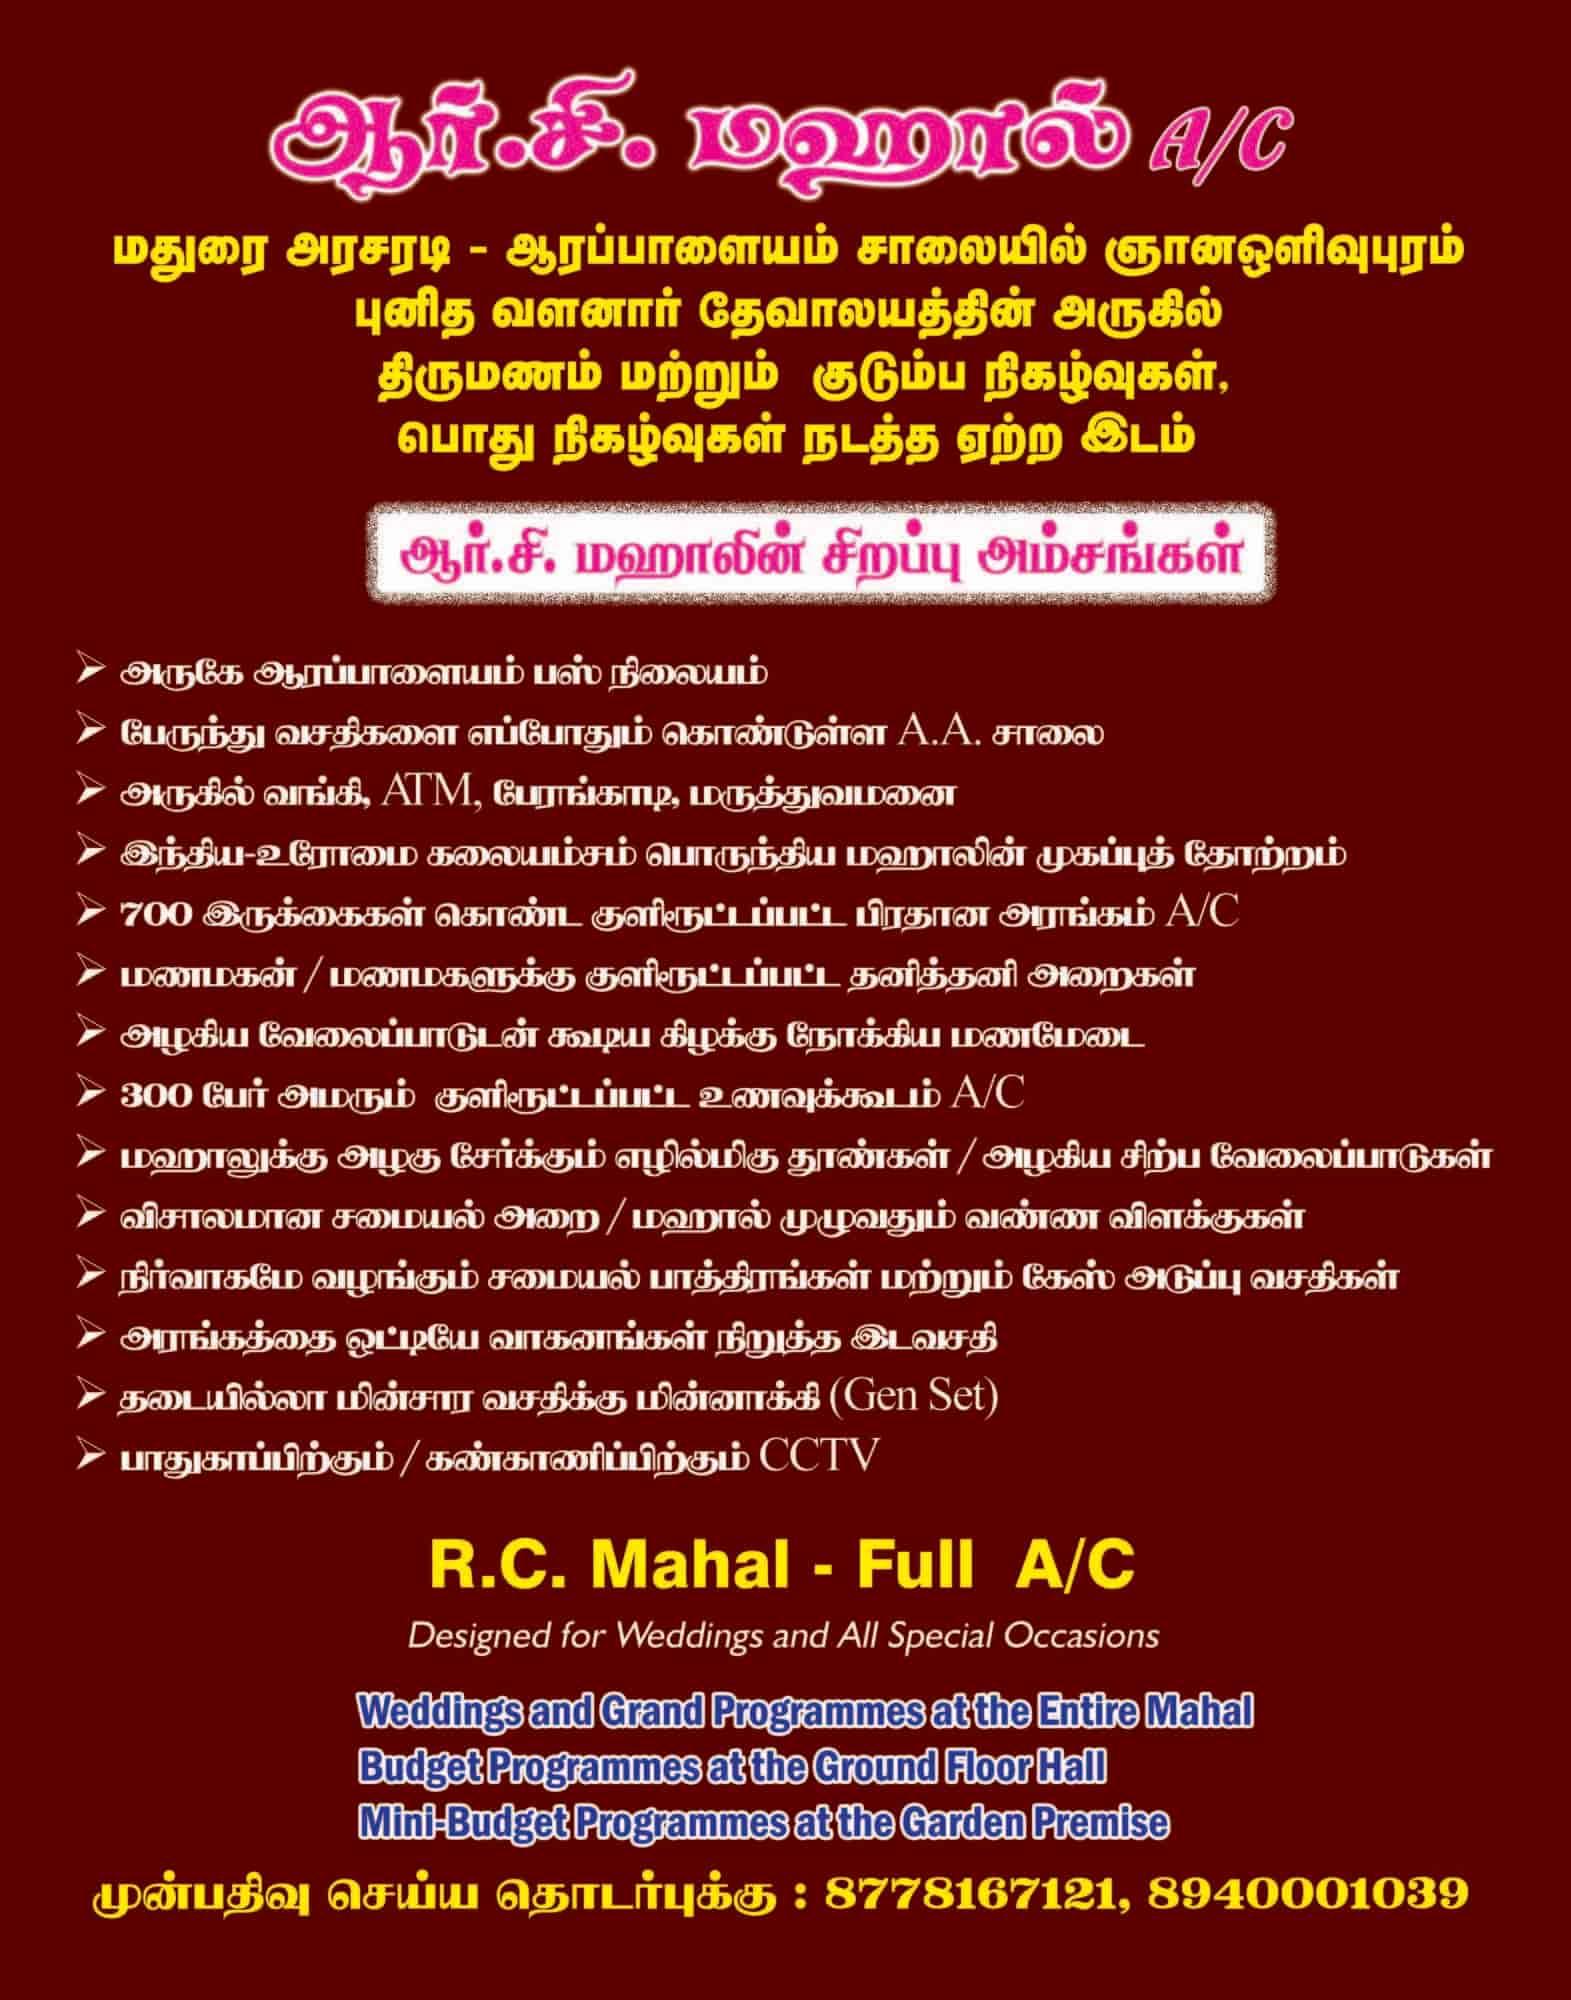 R C Mahal AC Photos, Arapalayam, Madurai- Pictures & Images